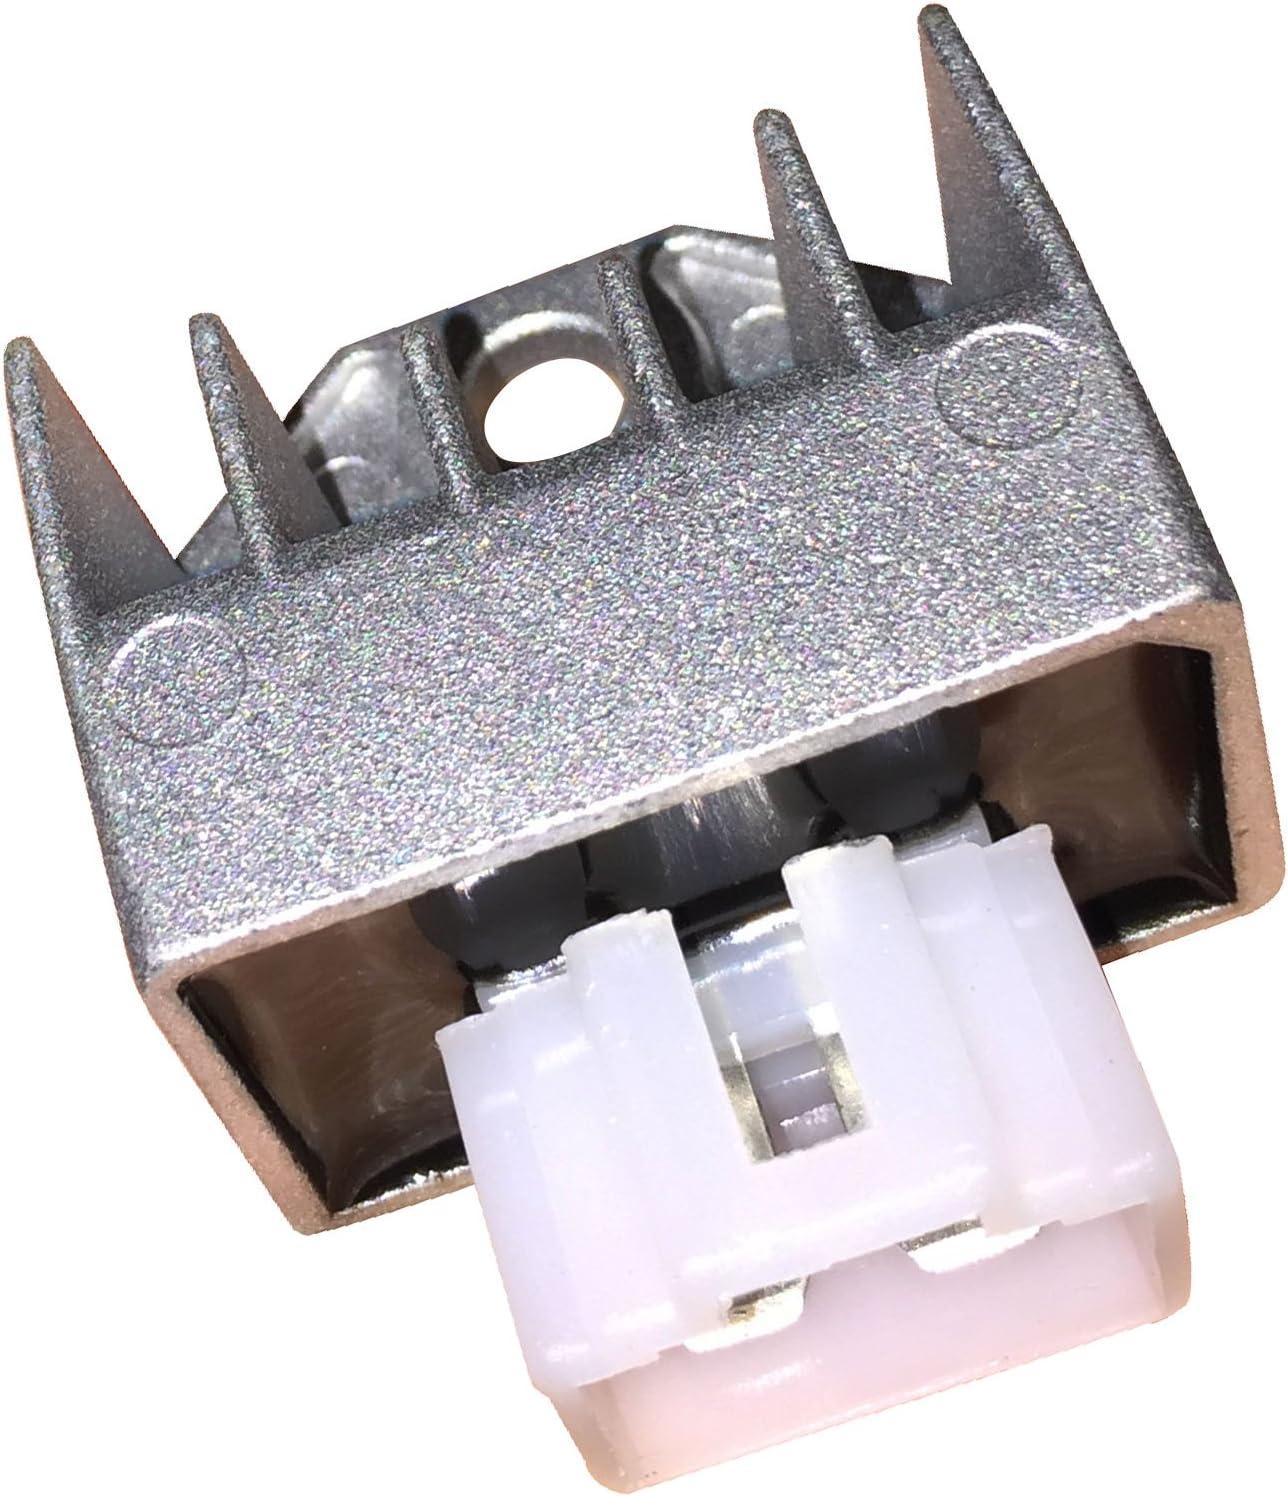 Motadin Regulator Rectifier for Yamaha 4CK-81960-01-00 5HH-H1960-00-00 4GU-H1960-00-00 SH620B-12